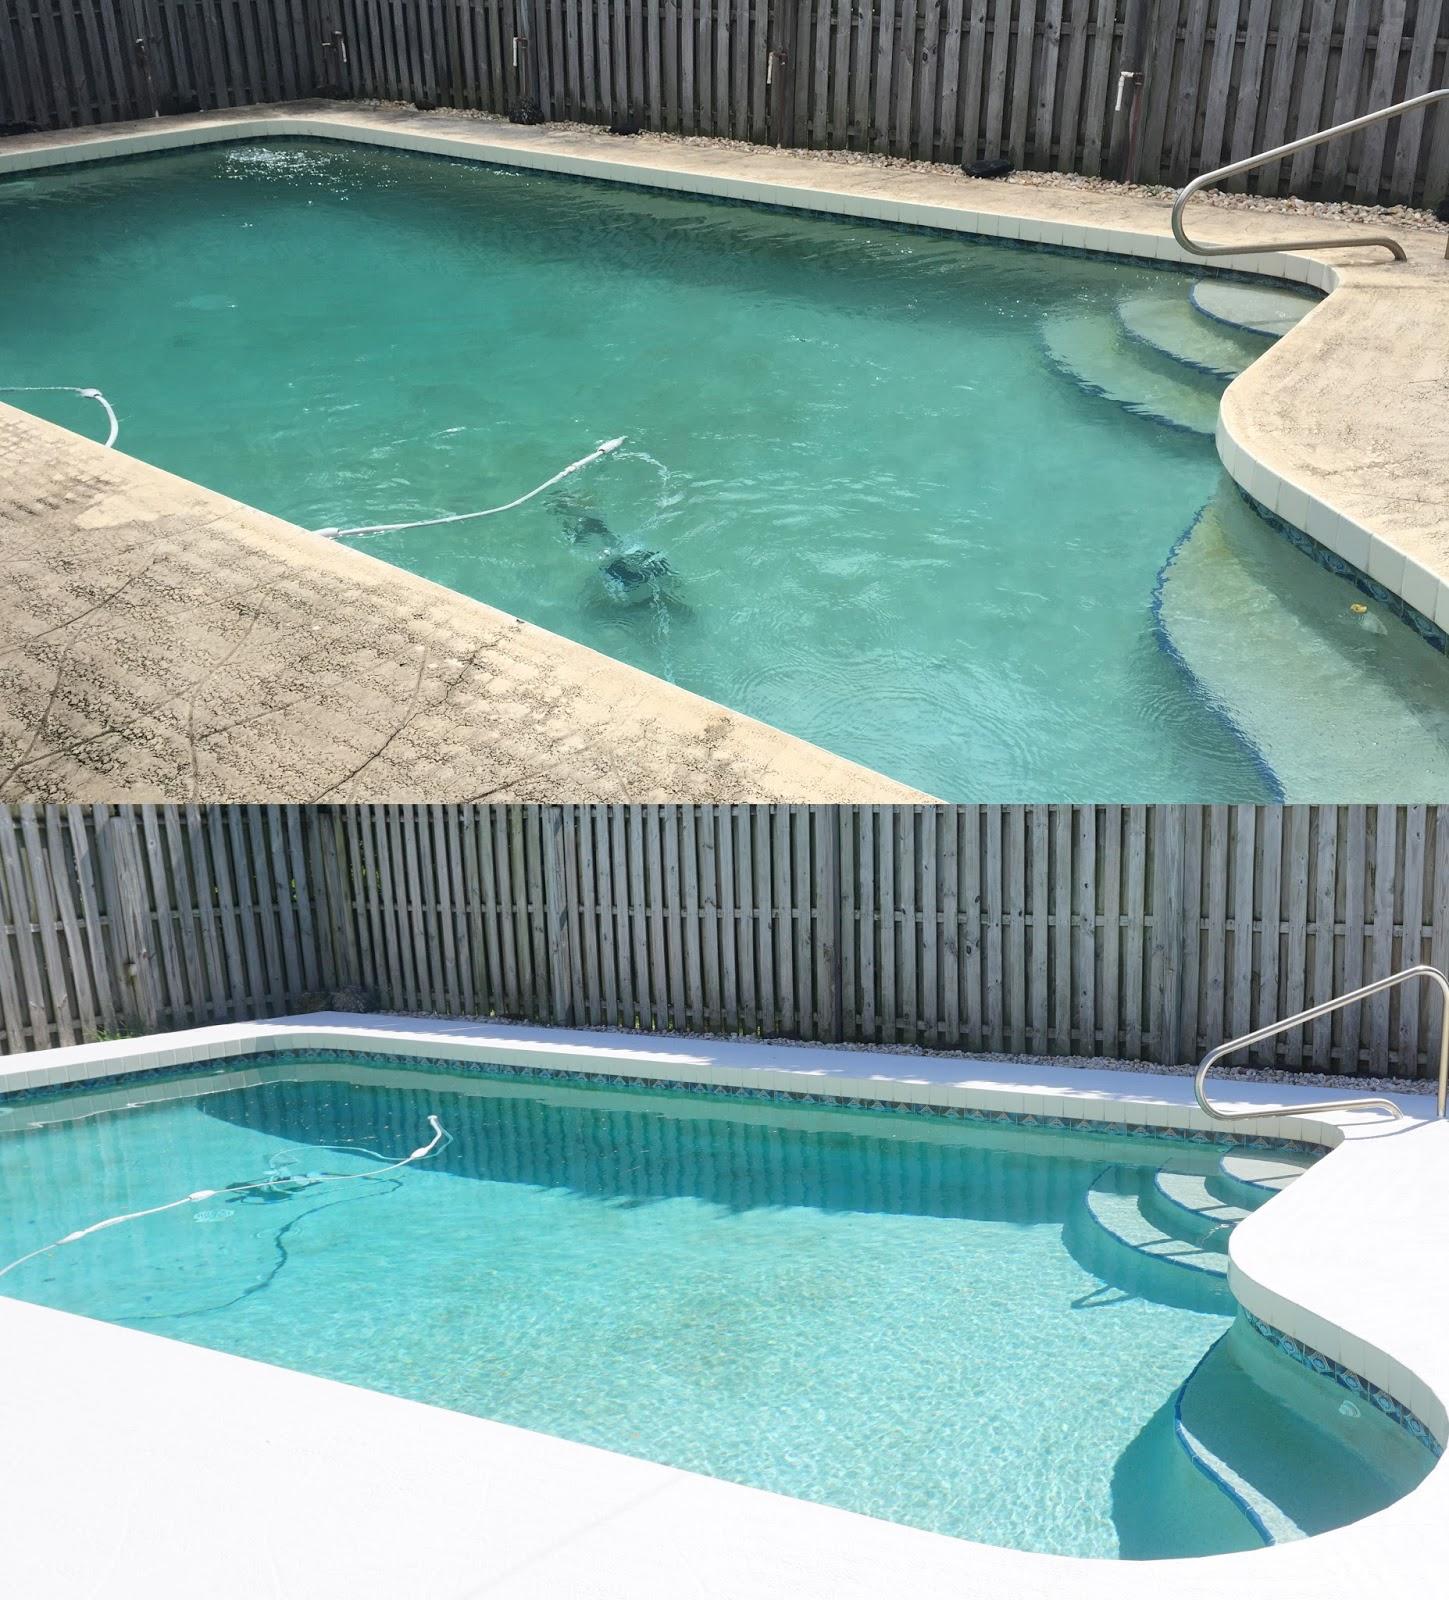 Lorraine Stanick How To Improve Pool Deck Behr